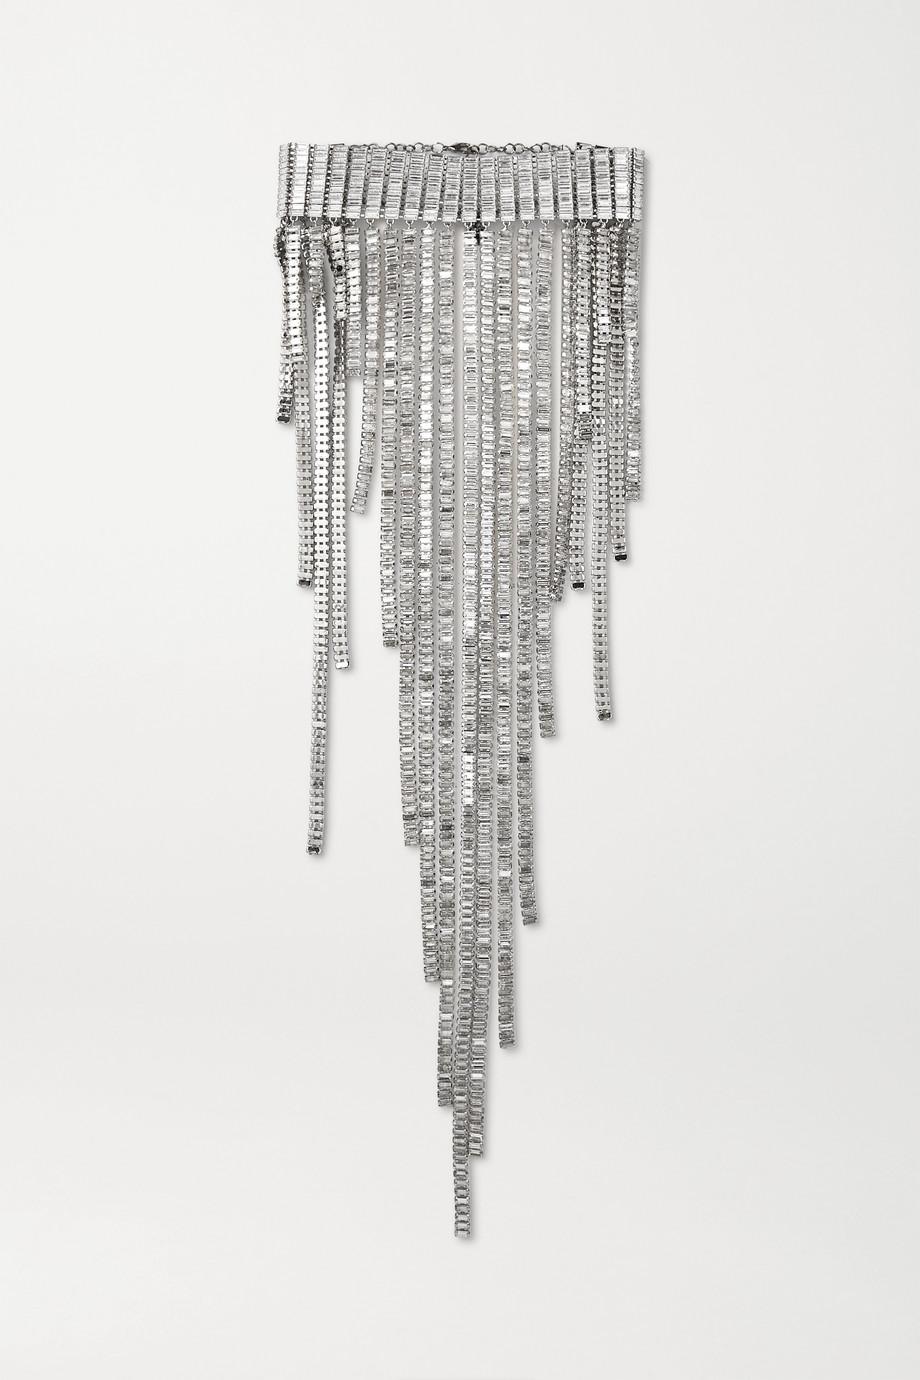 Rosantica Barlume silver-tone crystal choker